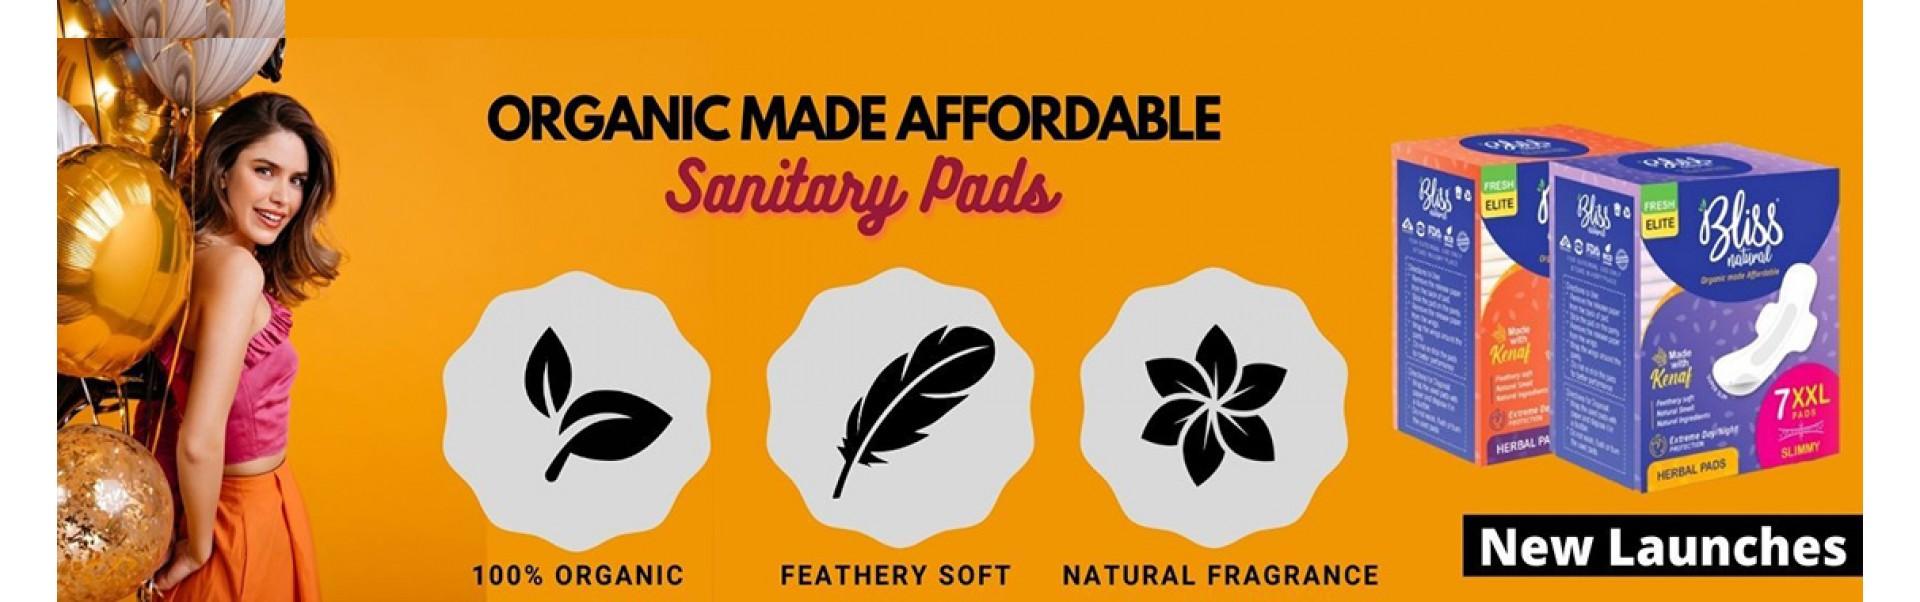 Organic biodegradable Sanitary Bliss Pads